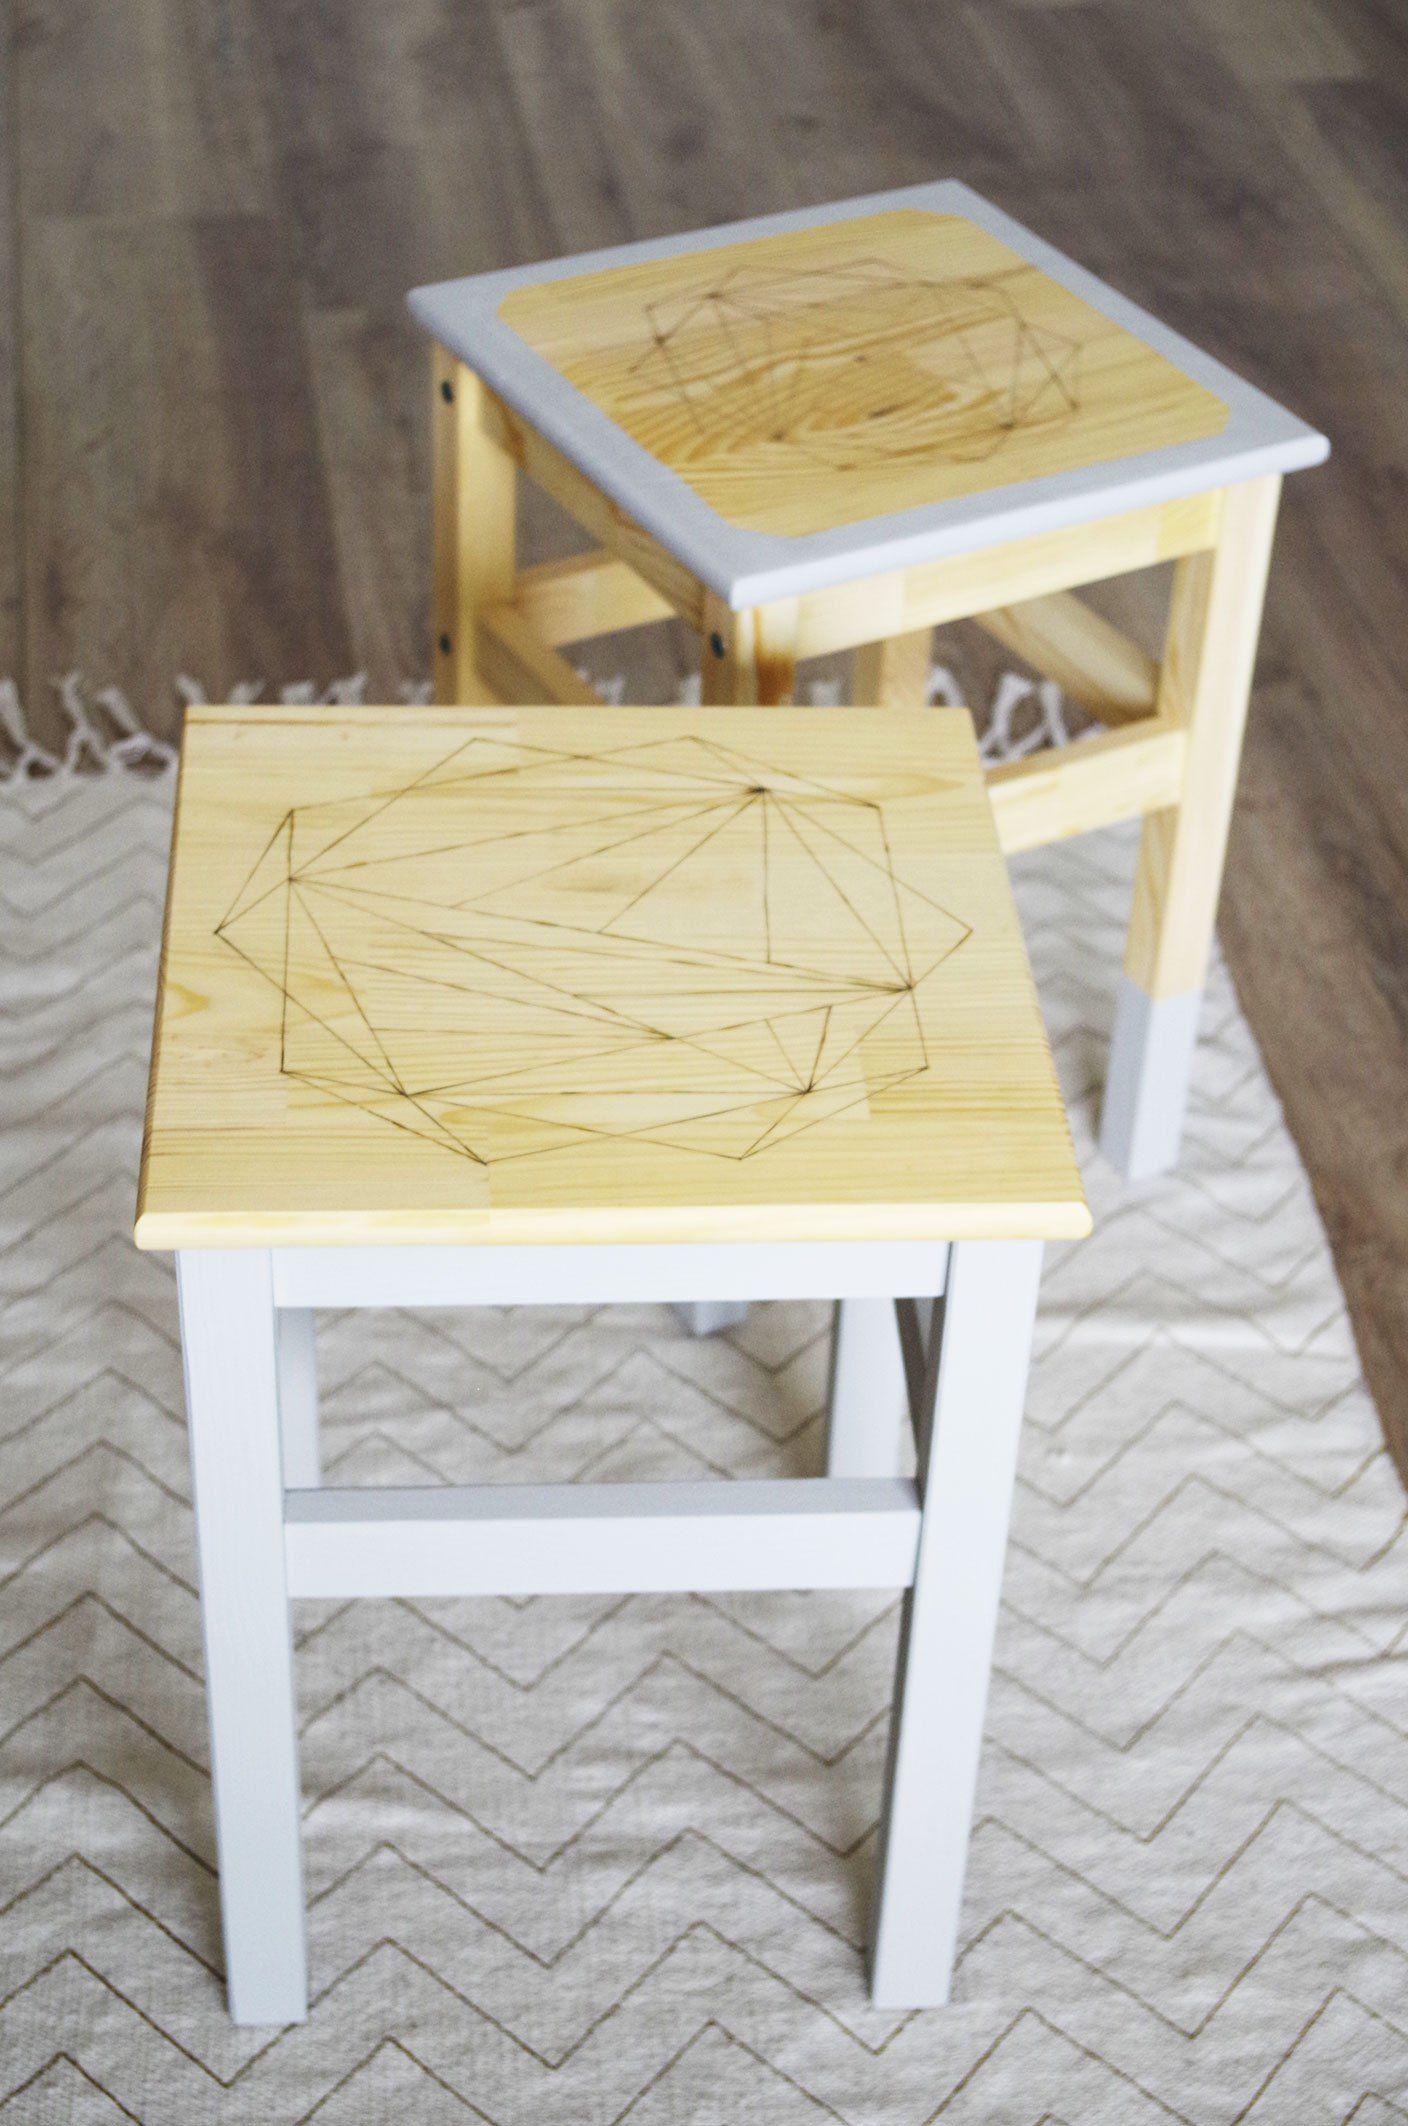 ikea hack n 3 les tabourets oddvar customis s avec la technique de la pyrogravure diy. Black Bedroom Furniture Sets. Home Design Ideas